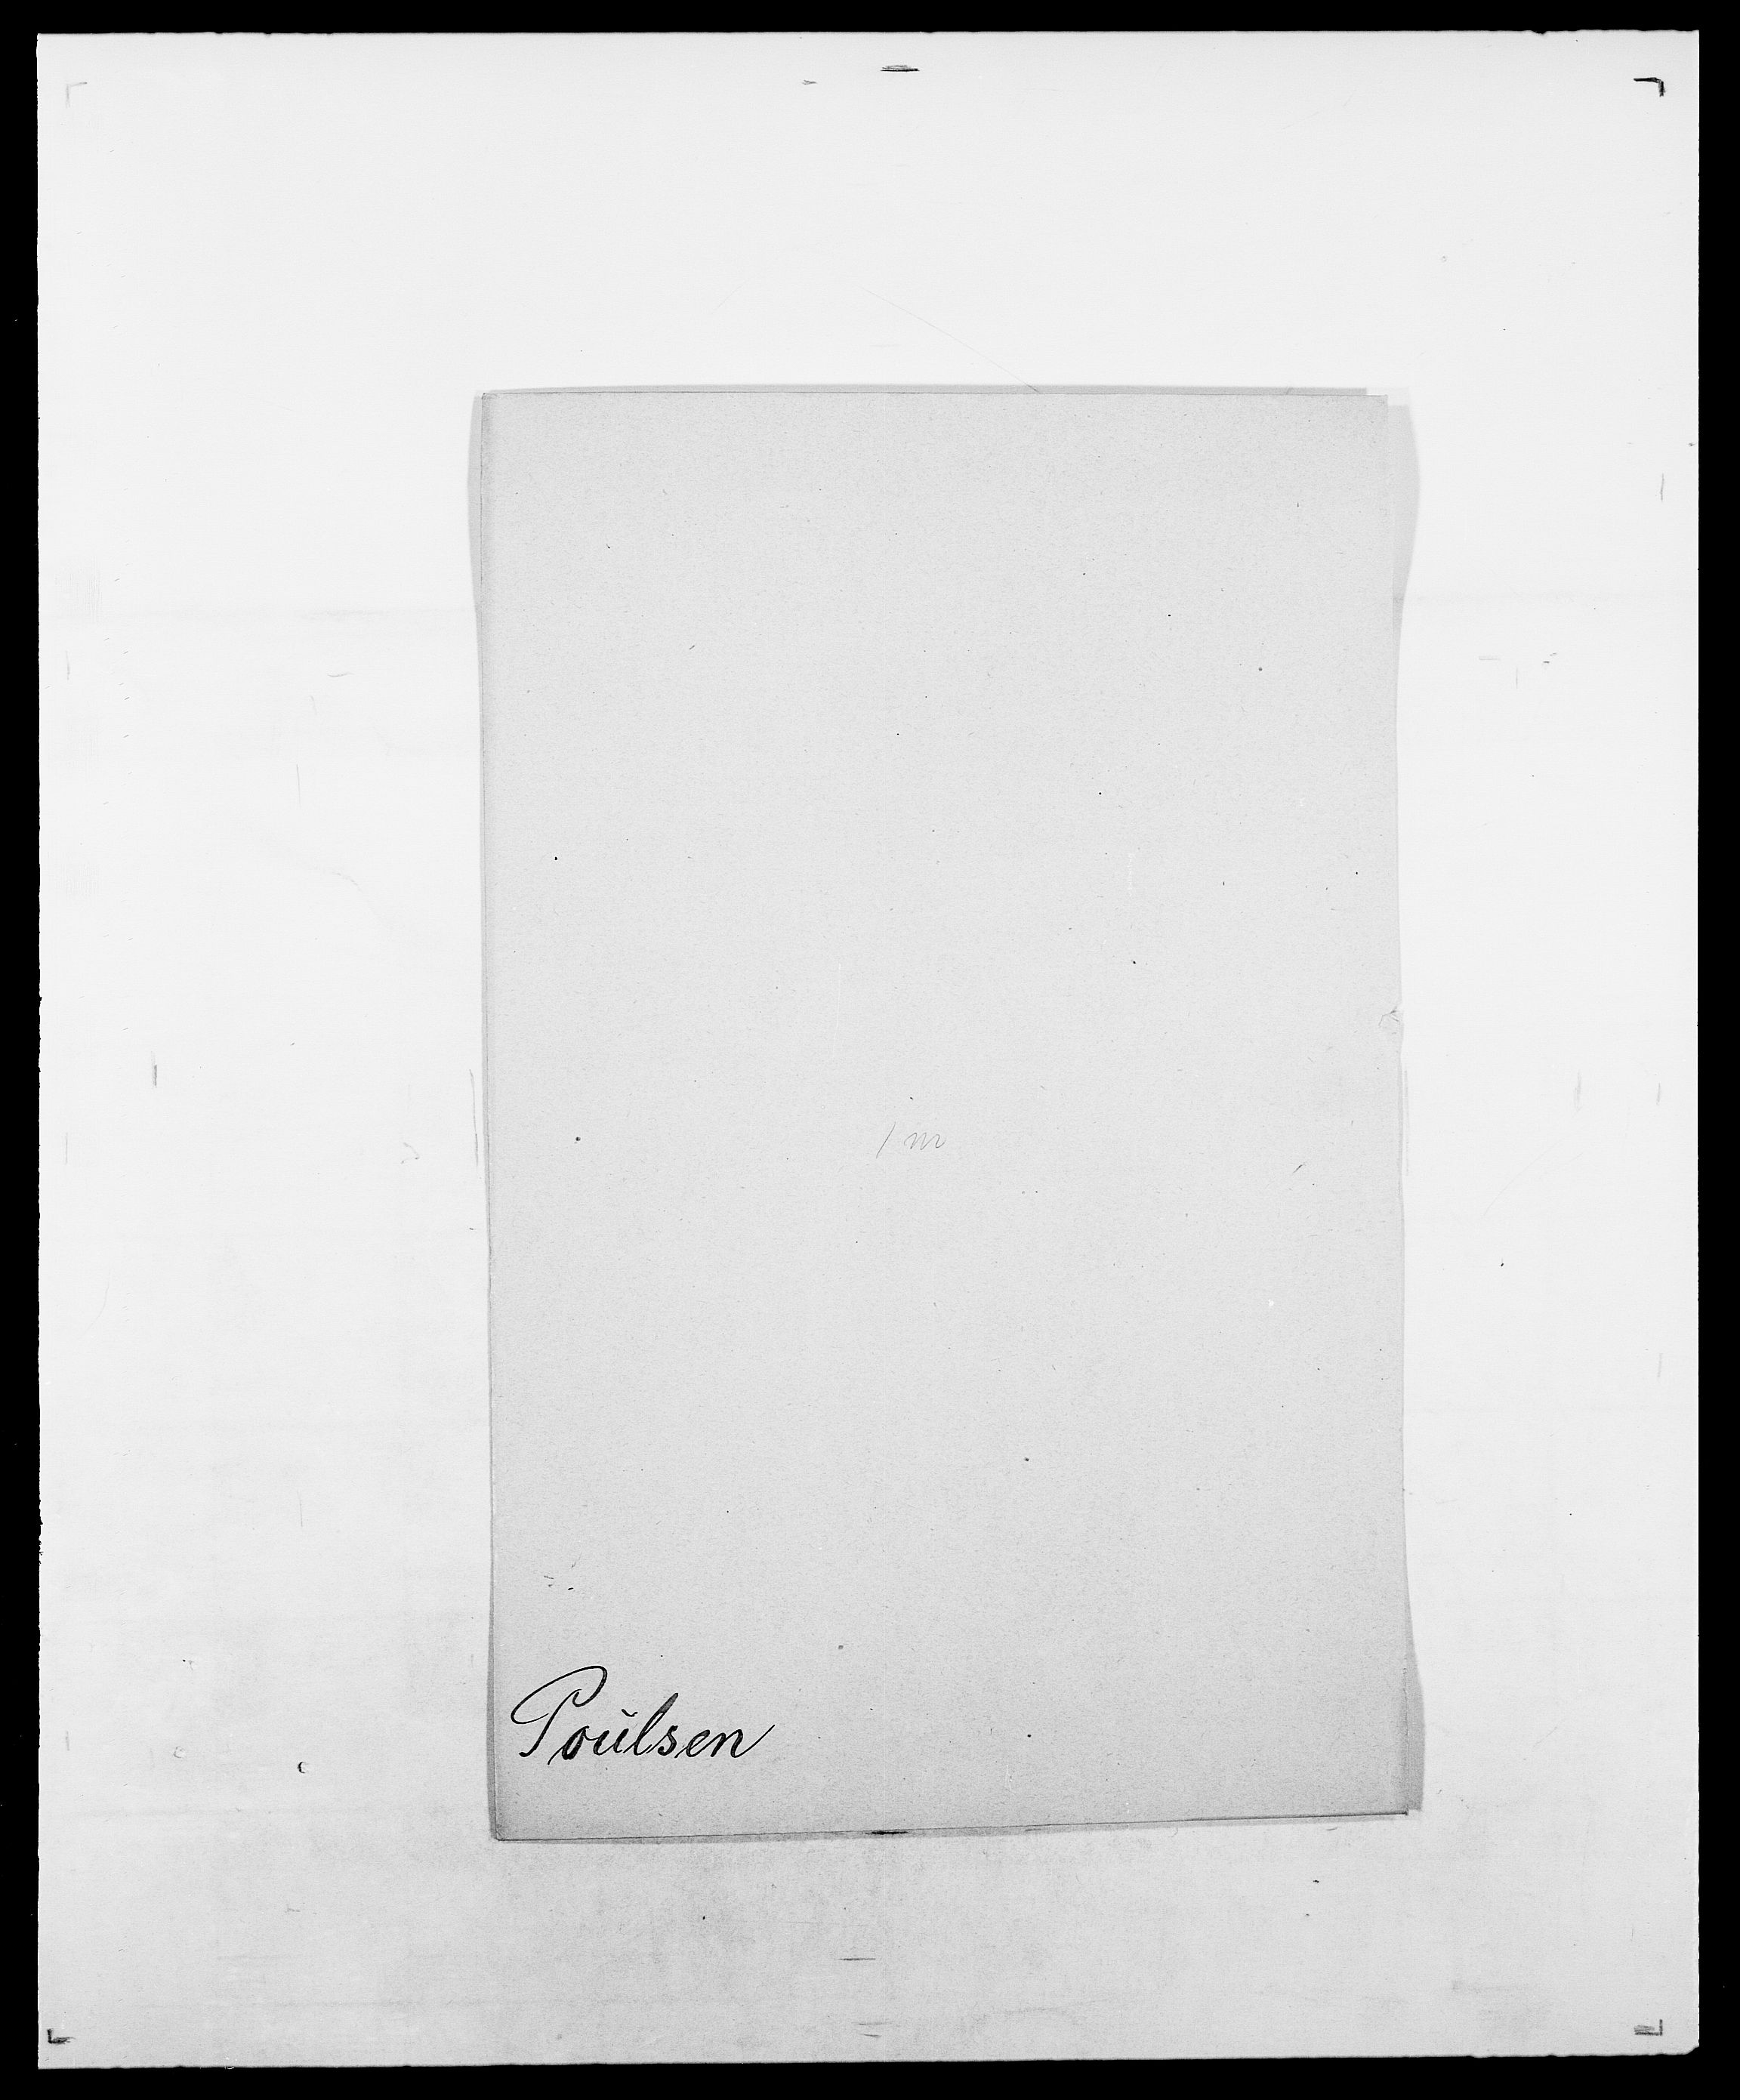 SAO, Delgobe, Charles Antoine - samling, D/Da/L0031: de Place - Raaum, s. 265